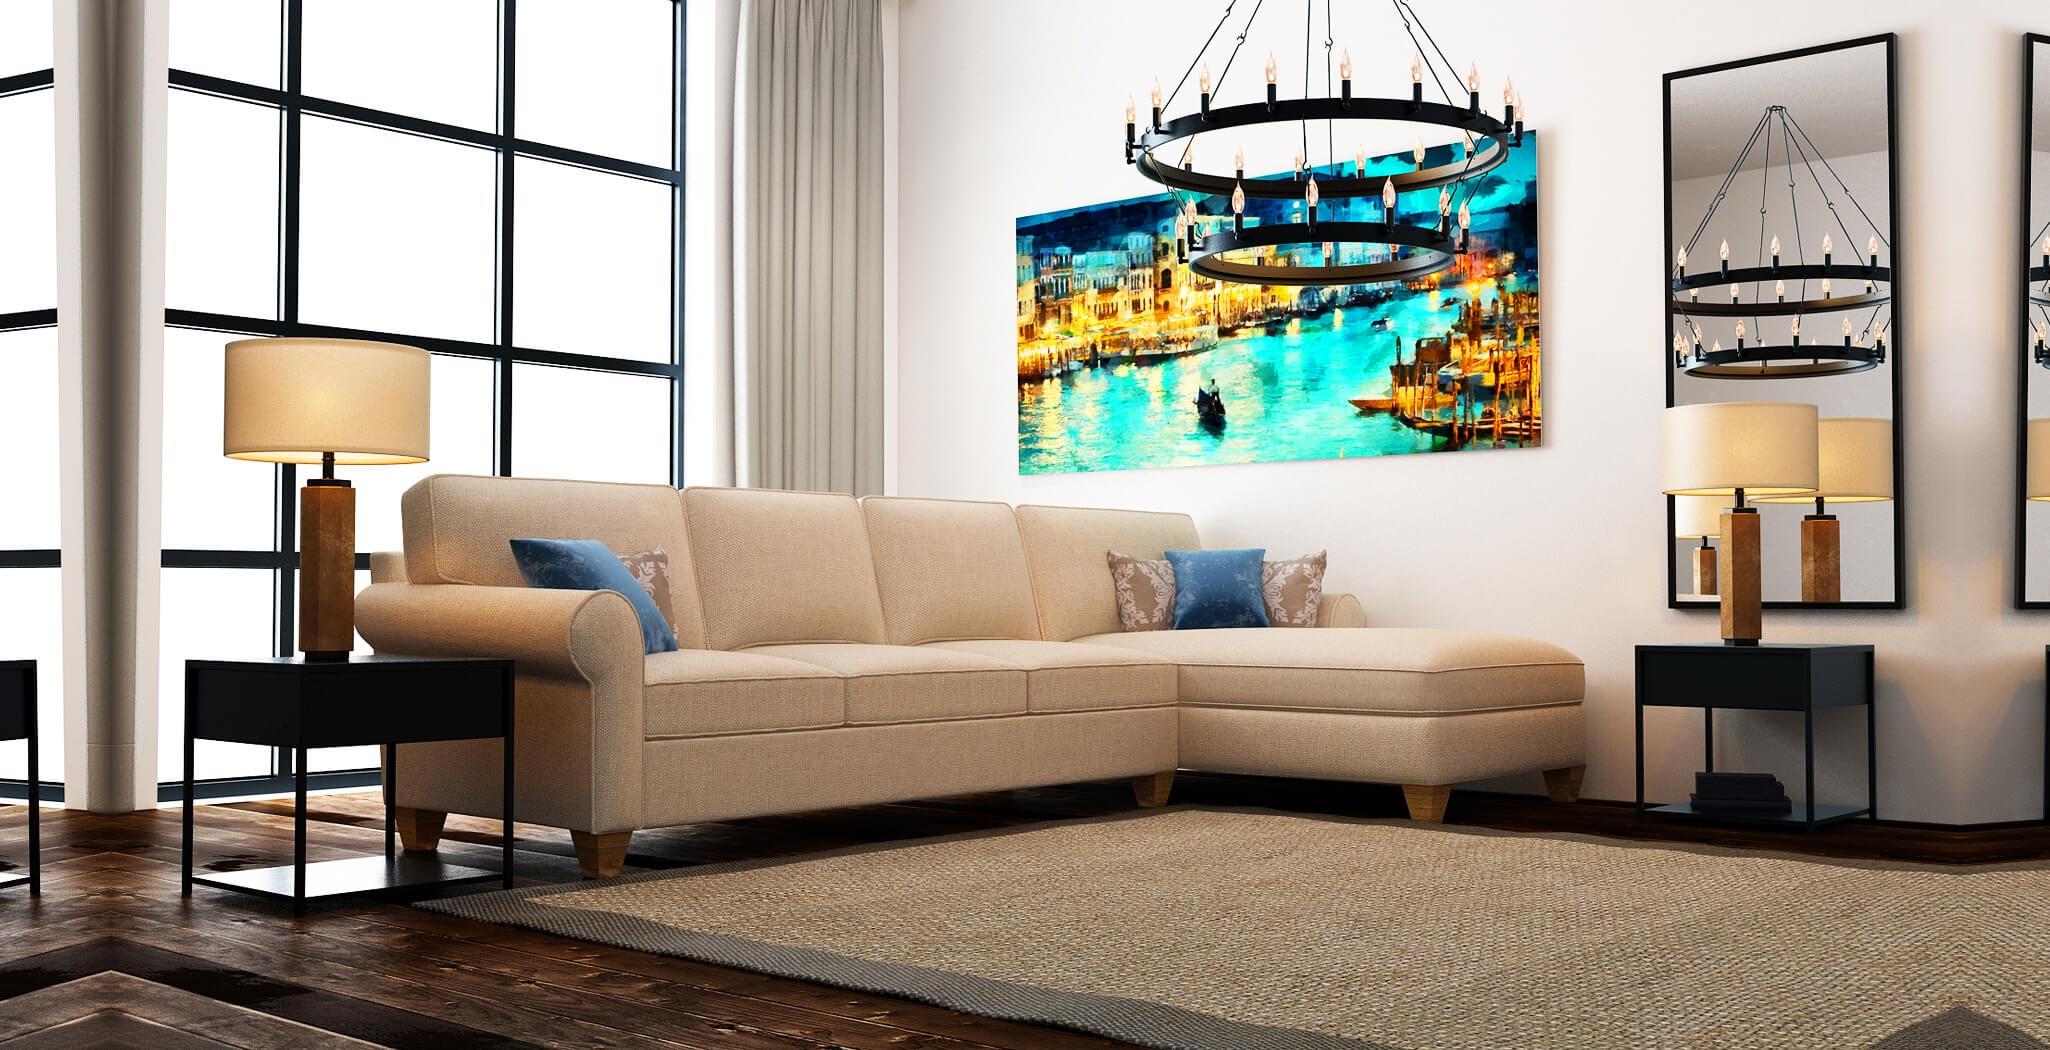 augusta panel furniture gallery 1